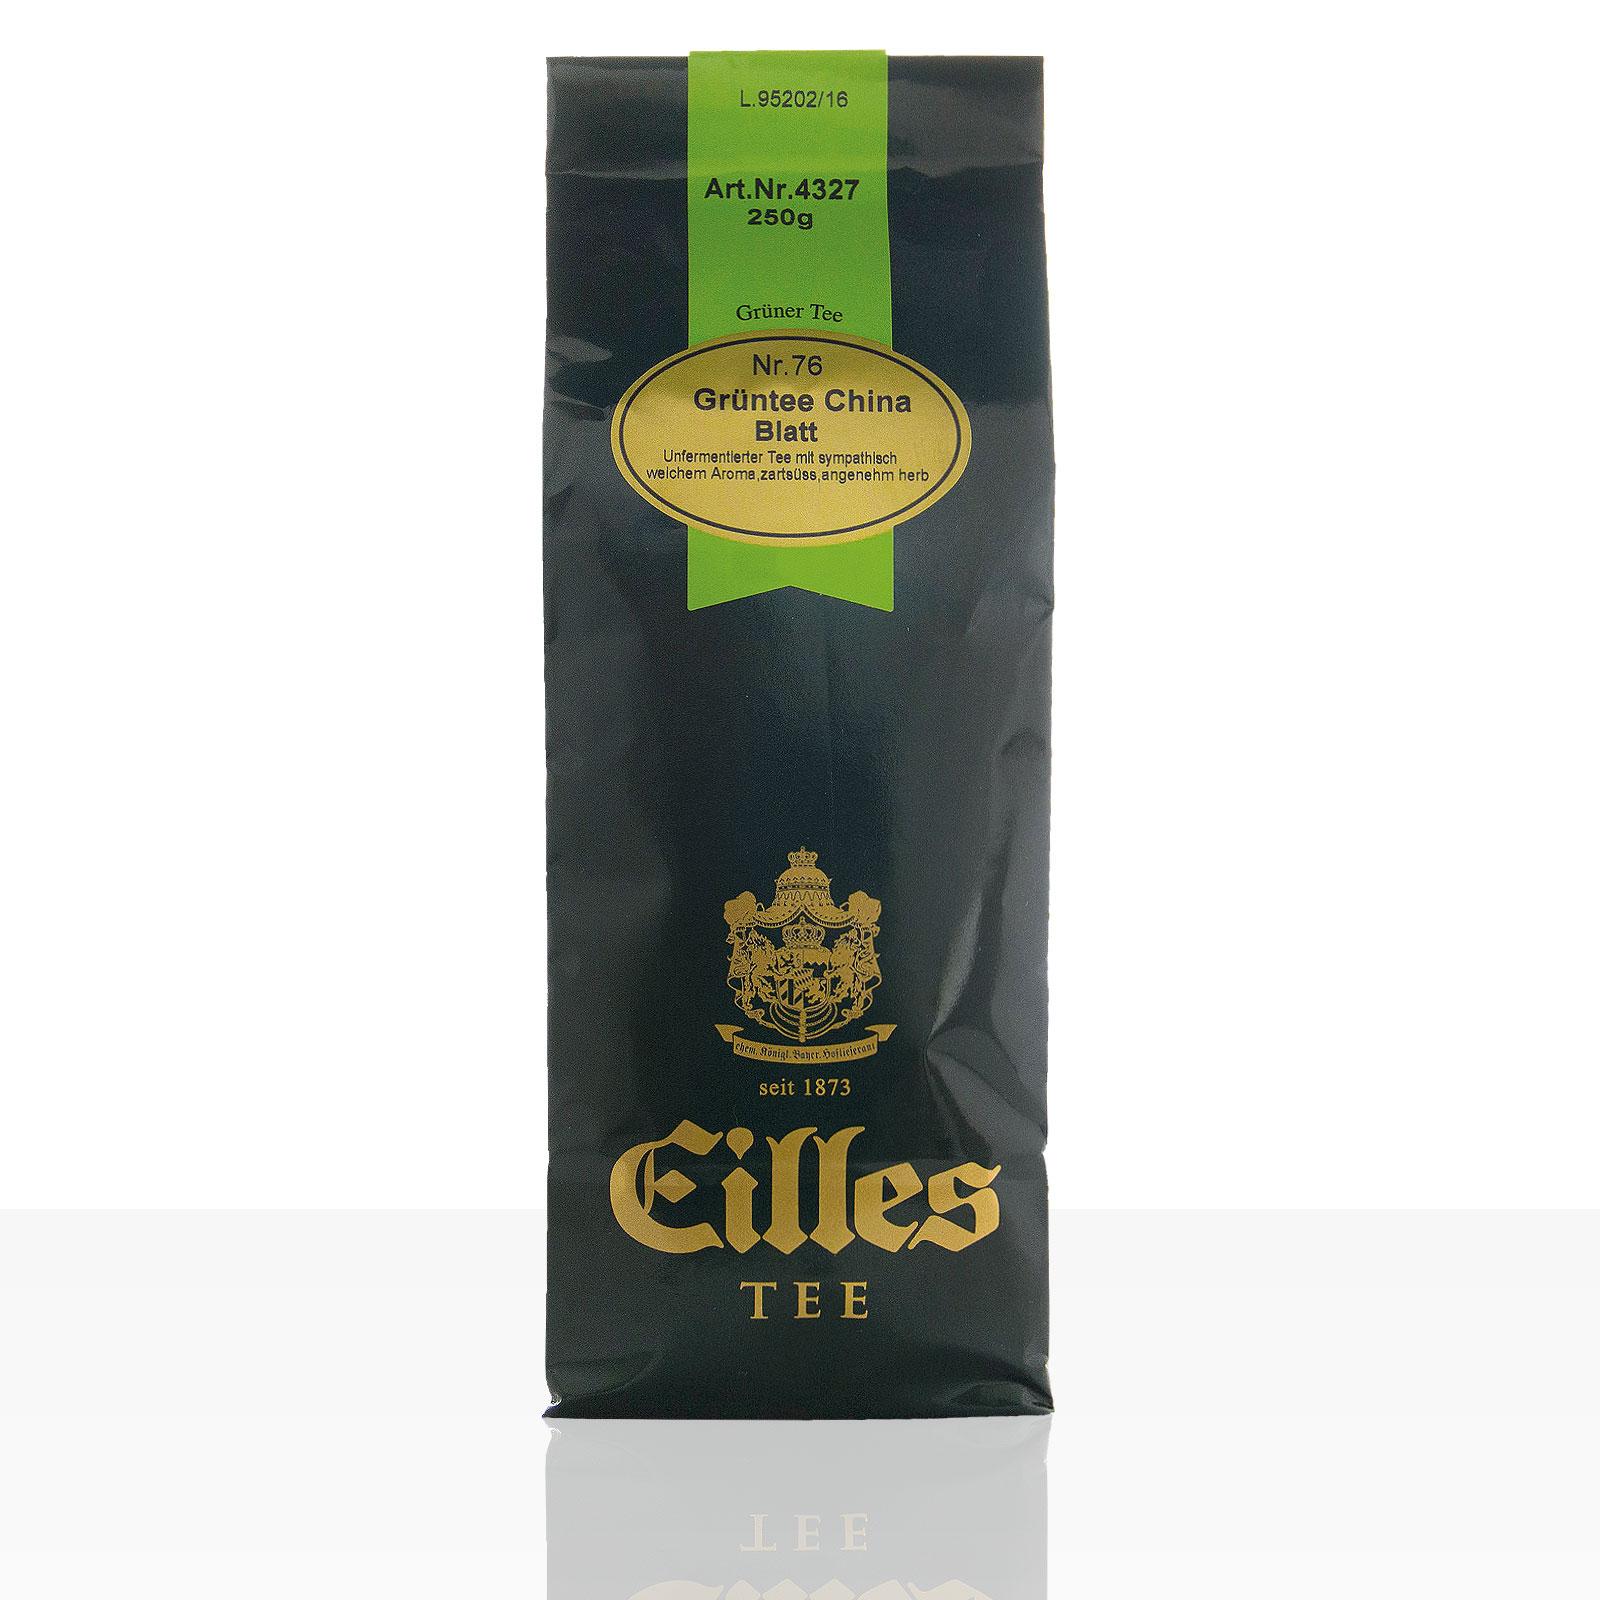 EILLES Tee China Grüntee Blatt Nr. 76, 250g loser Tee